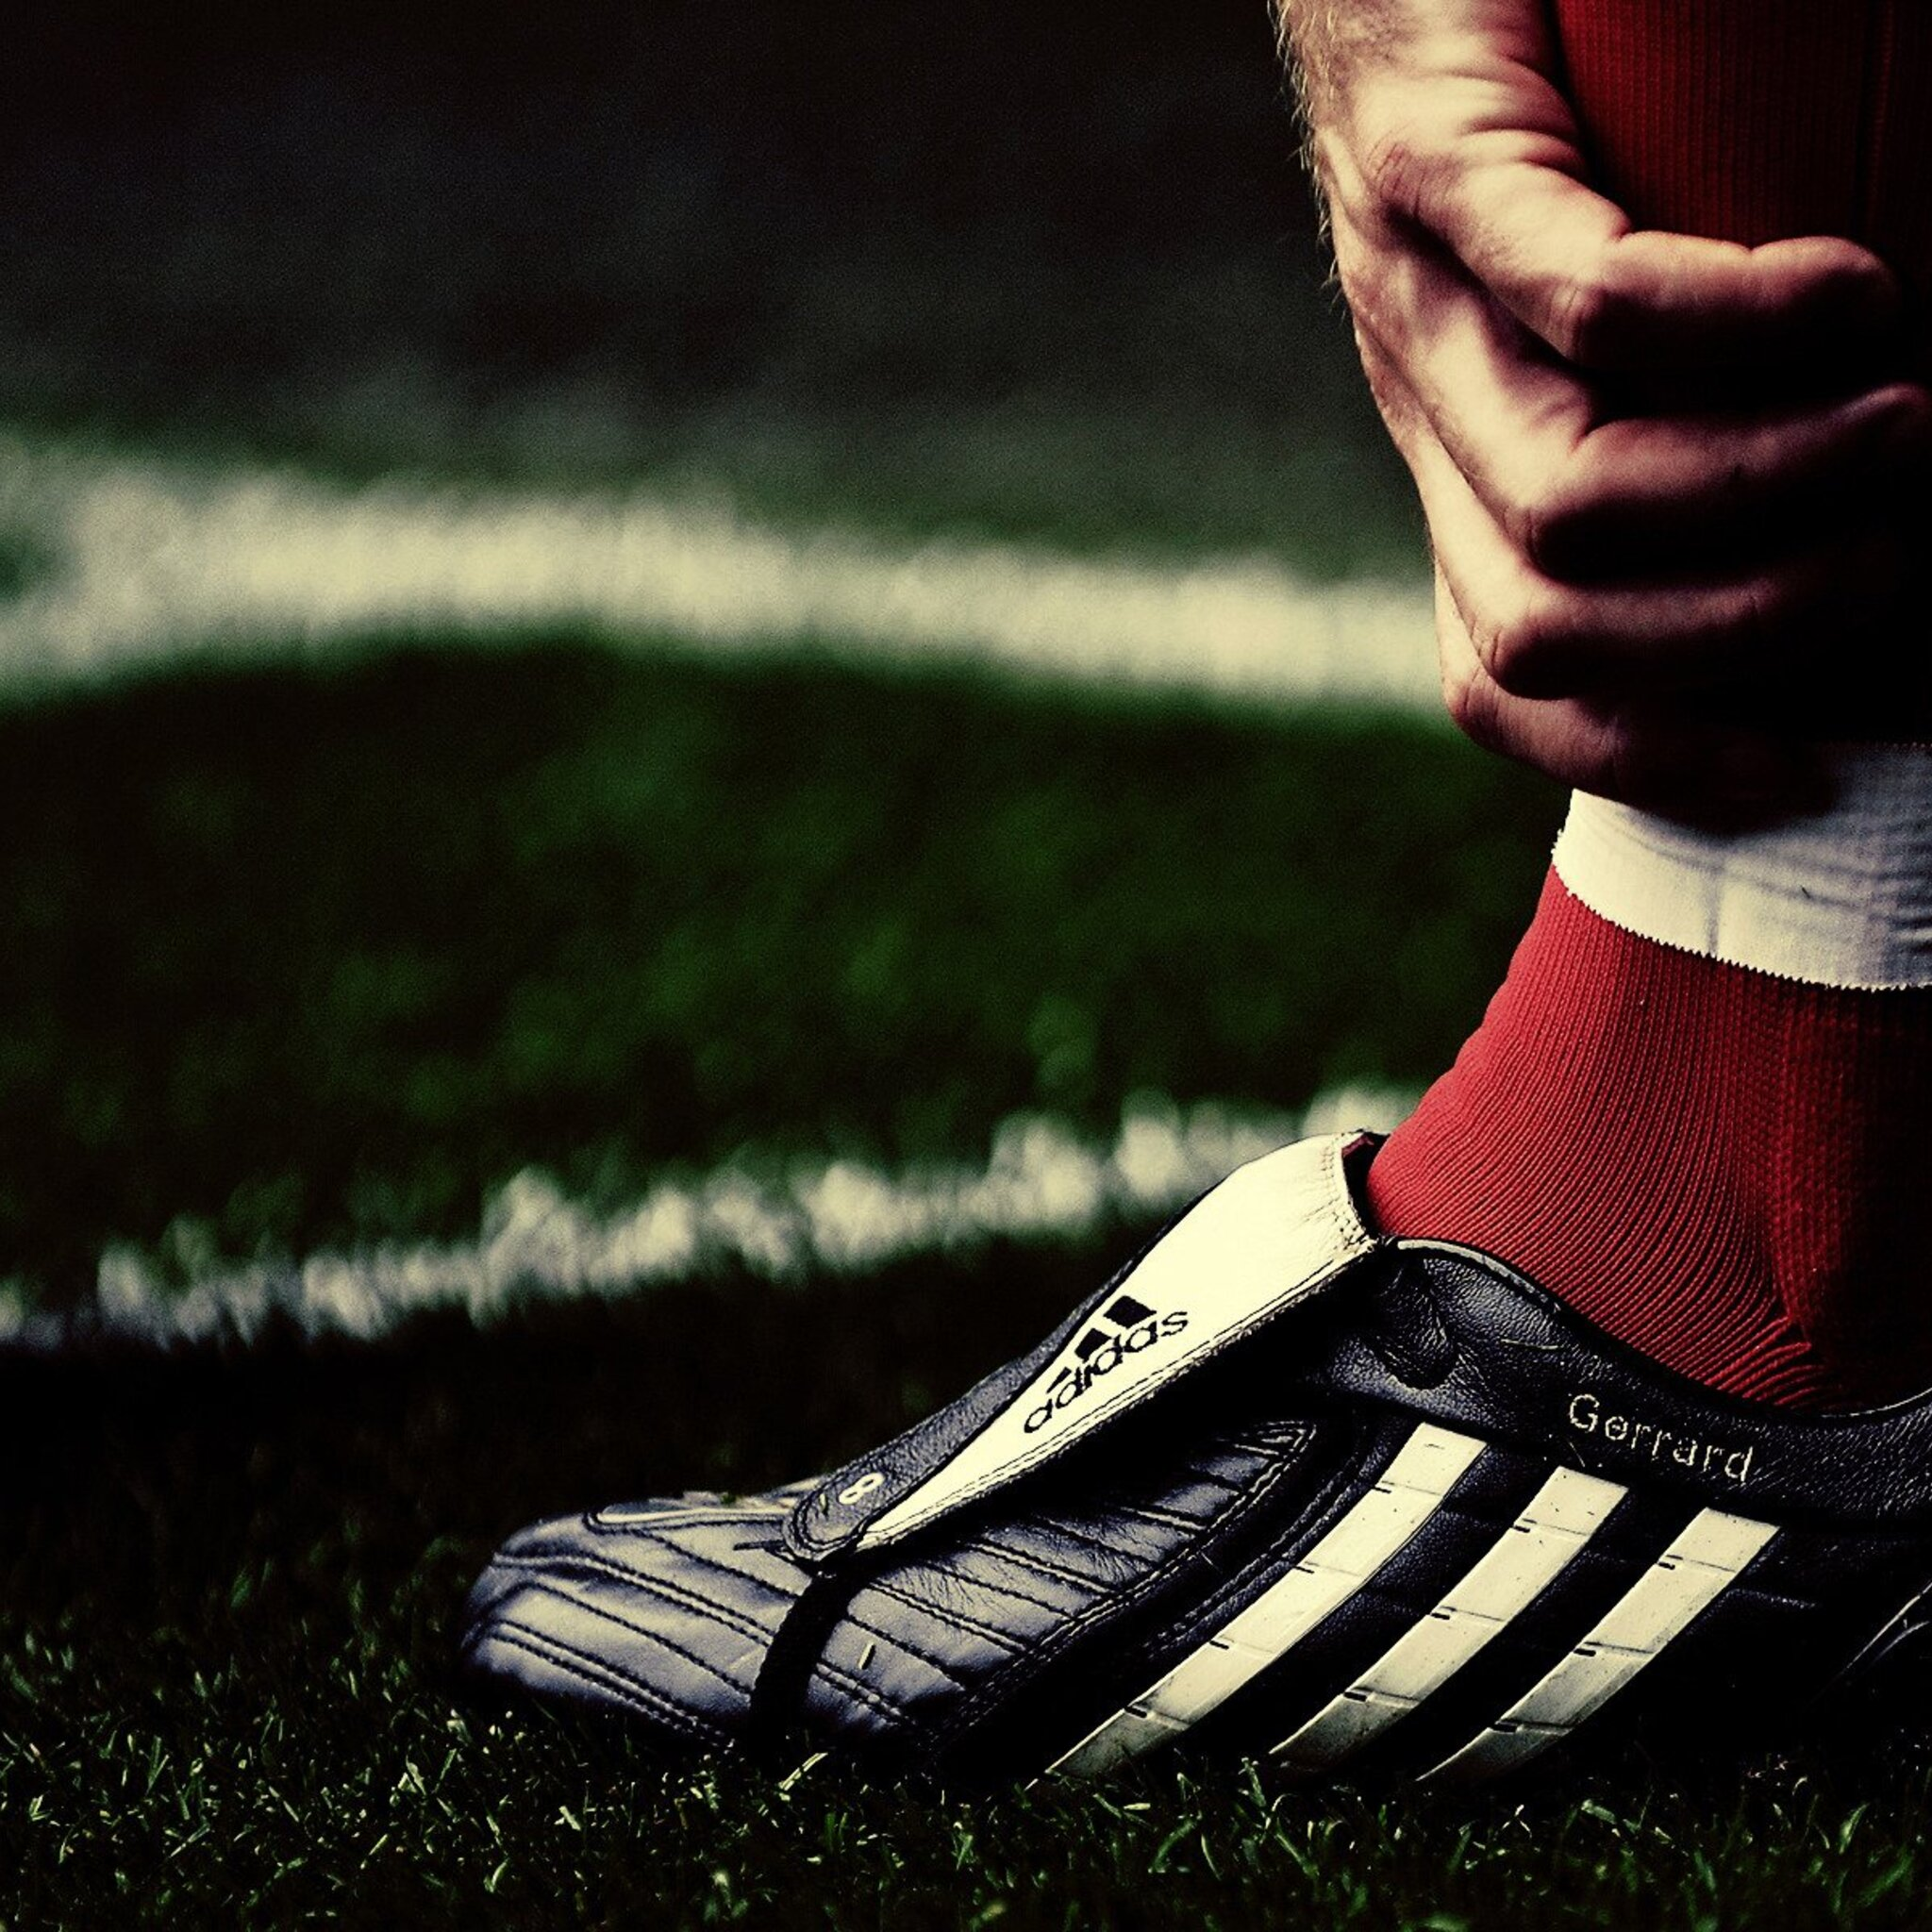 adidas-sports-shoes-pic.jpg